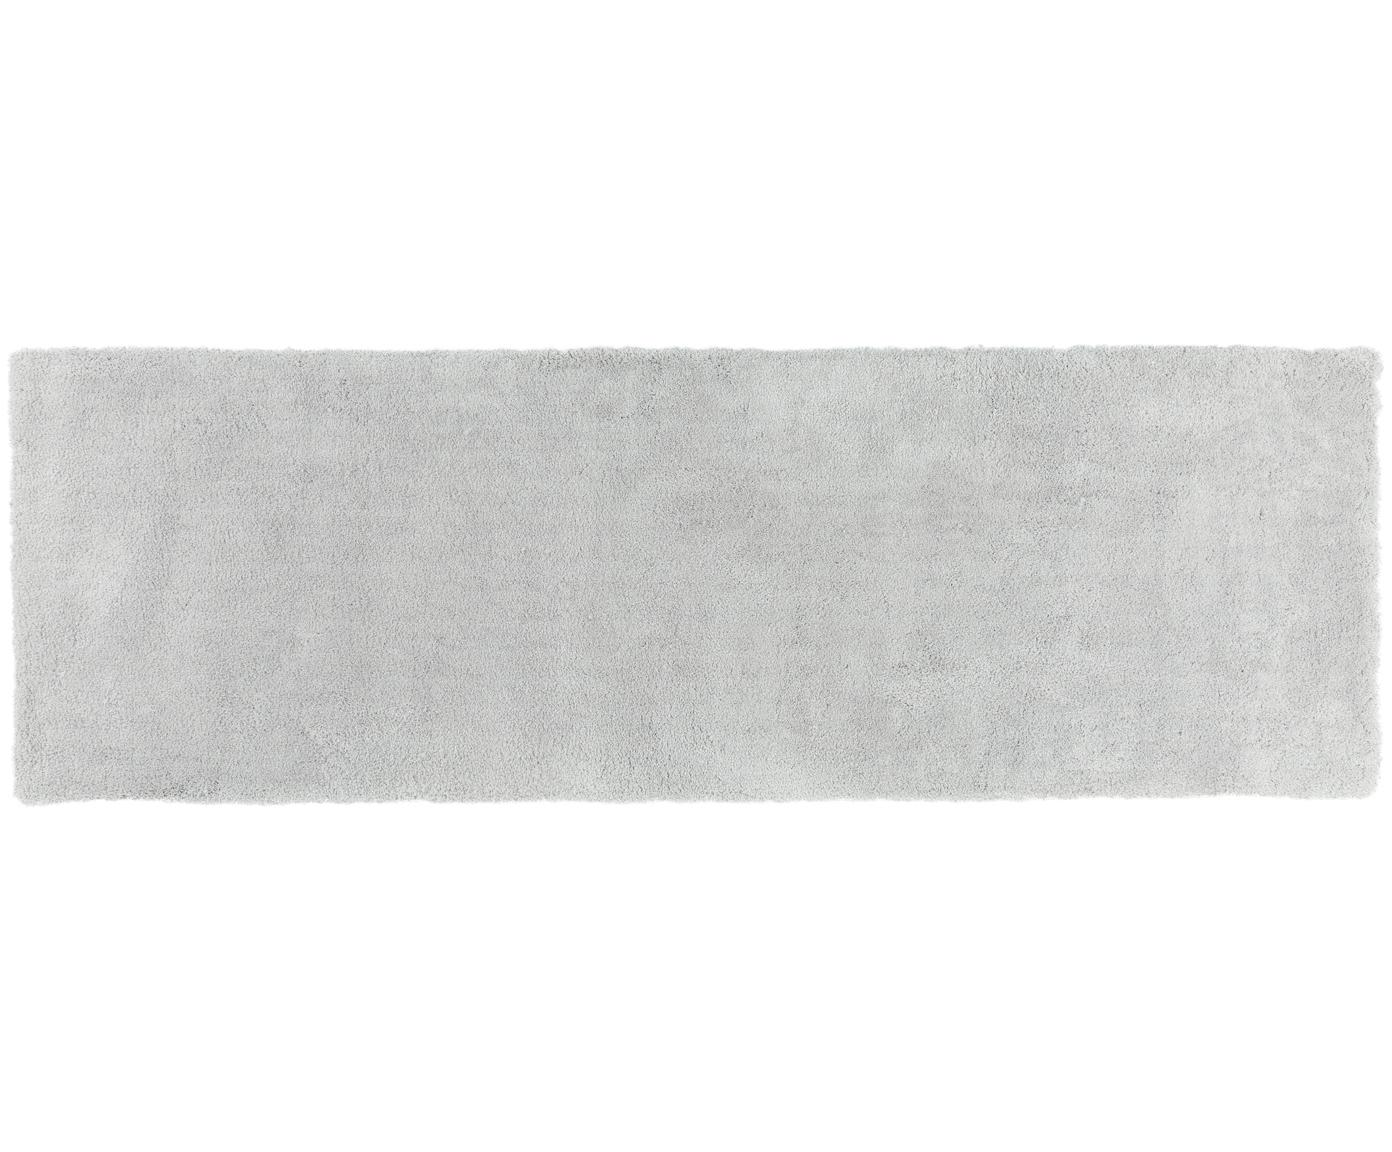 Alfombra de pelo largo Leighton, Parte superior: 100%poliéster (microfibr, Reverso: 100%poliéster, Gris claro, An 80 x L 250 cm